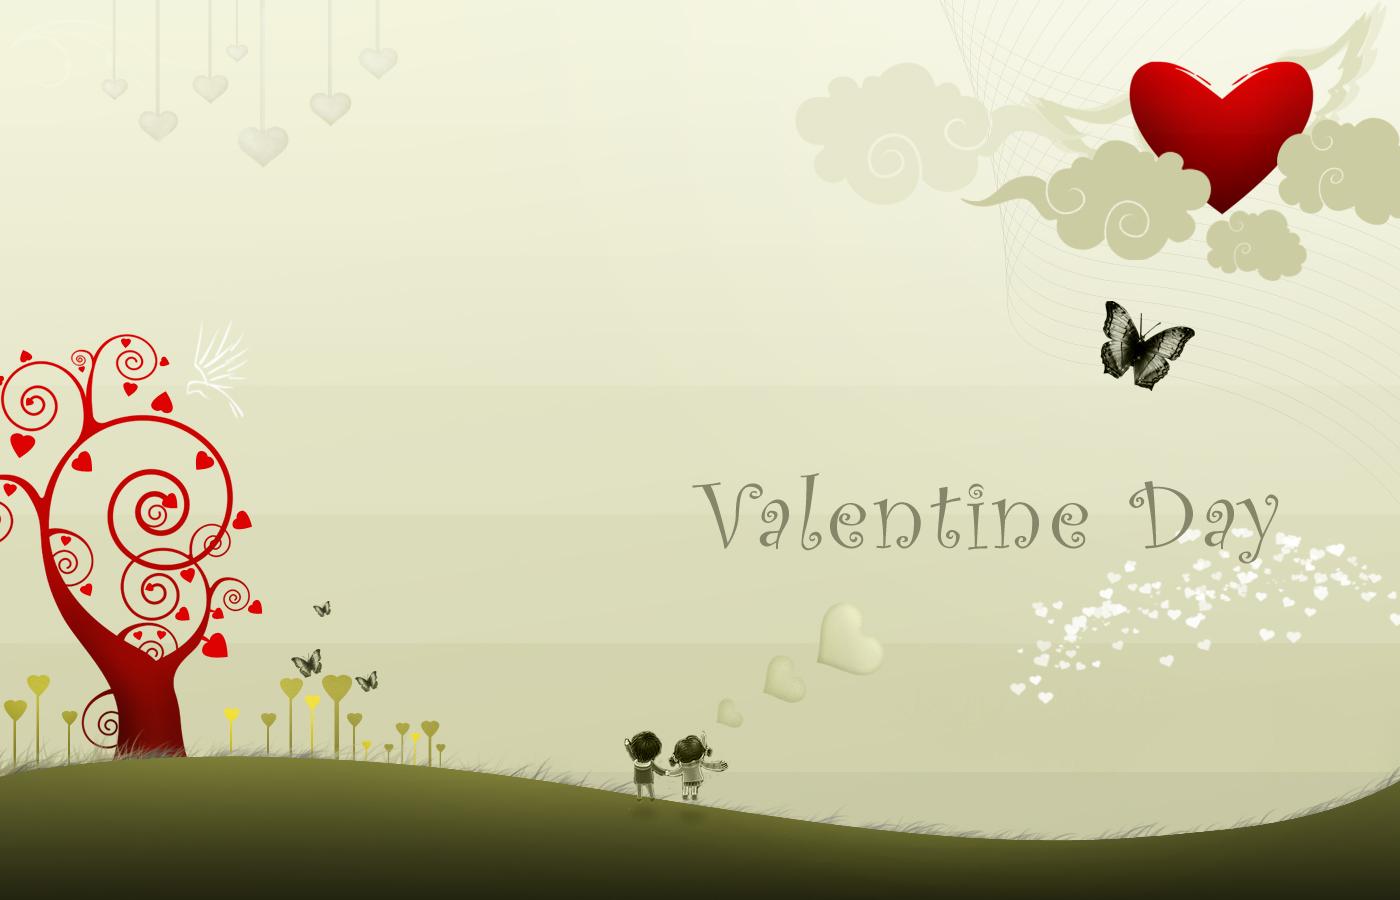 http://fc02.deviantart.net/fs41/f/2009/041/d/f/Valentine_Special_by_preet618.jpg